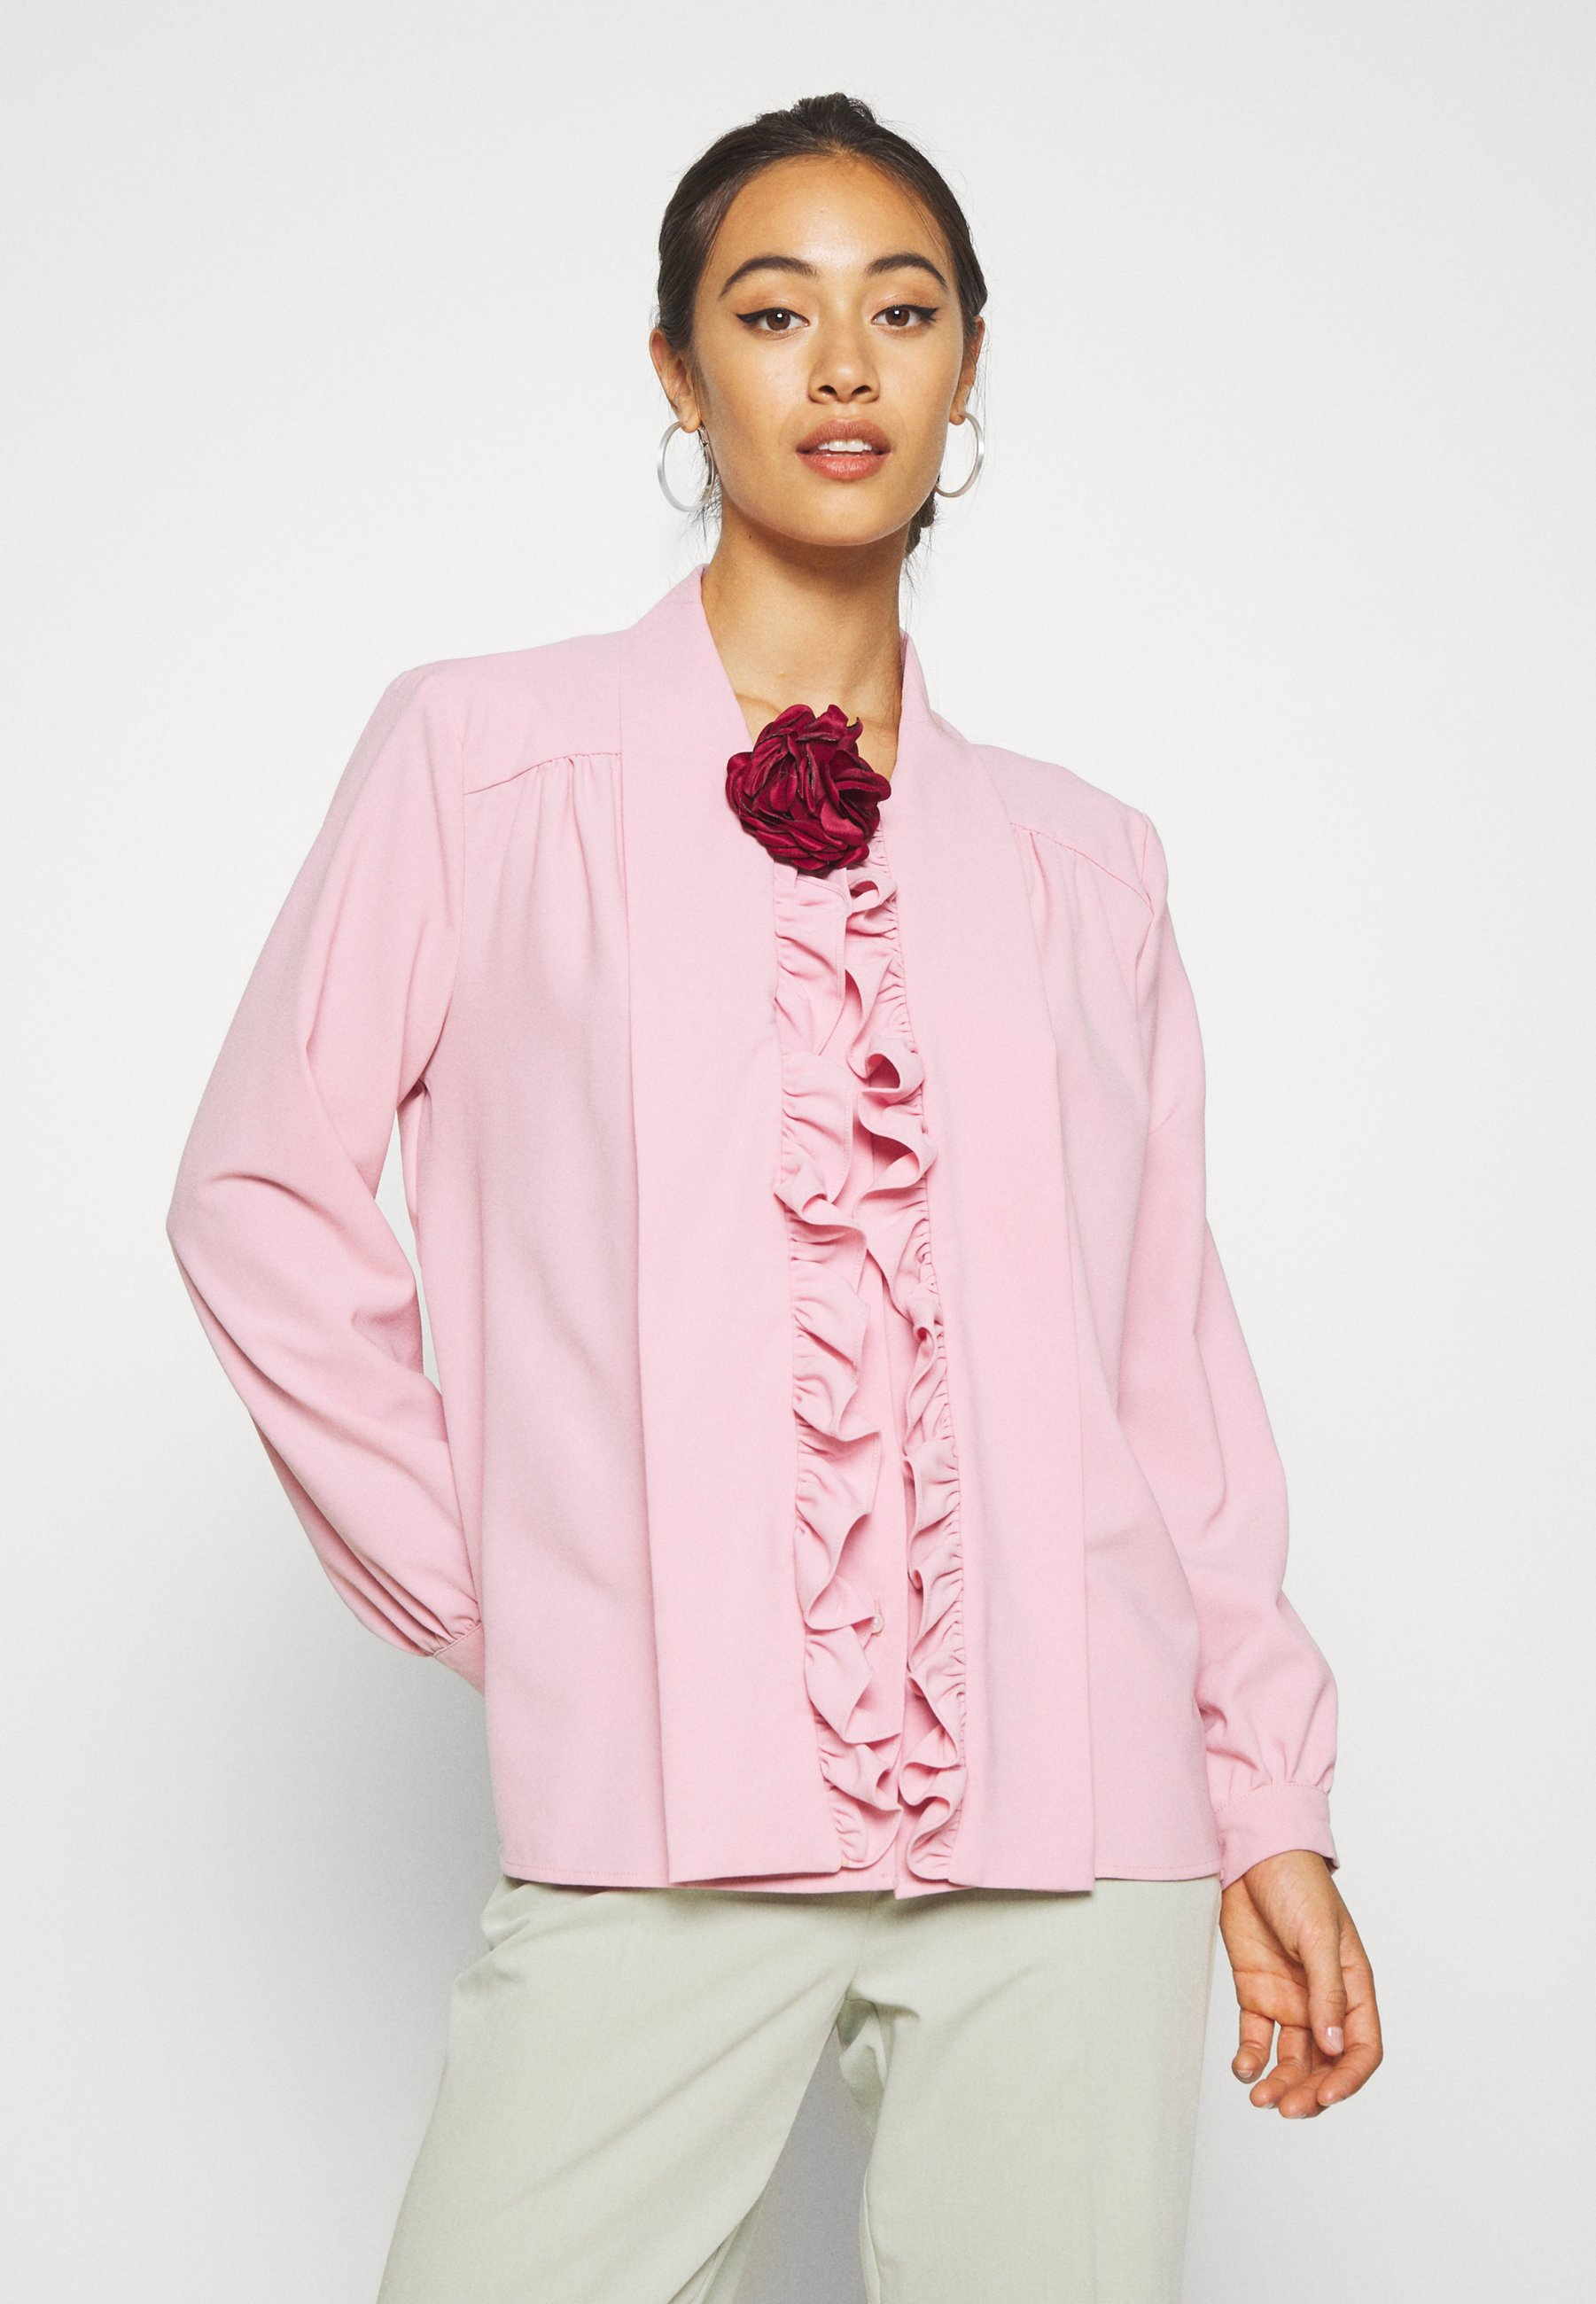 Sister Jane POWDER ROSE BOW - Blouse - pink - Dameskleding AAA-kwaliteit